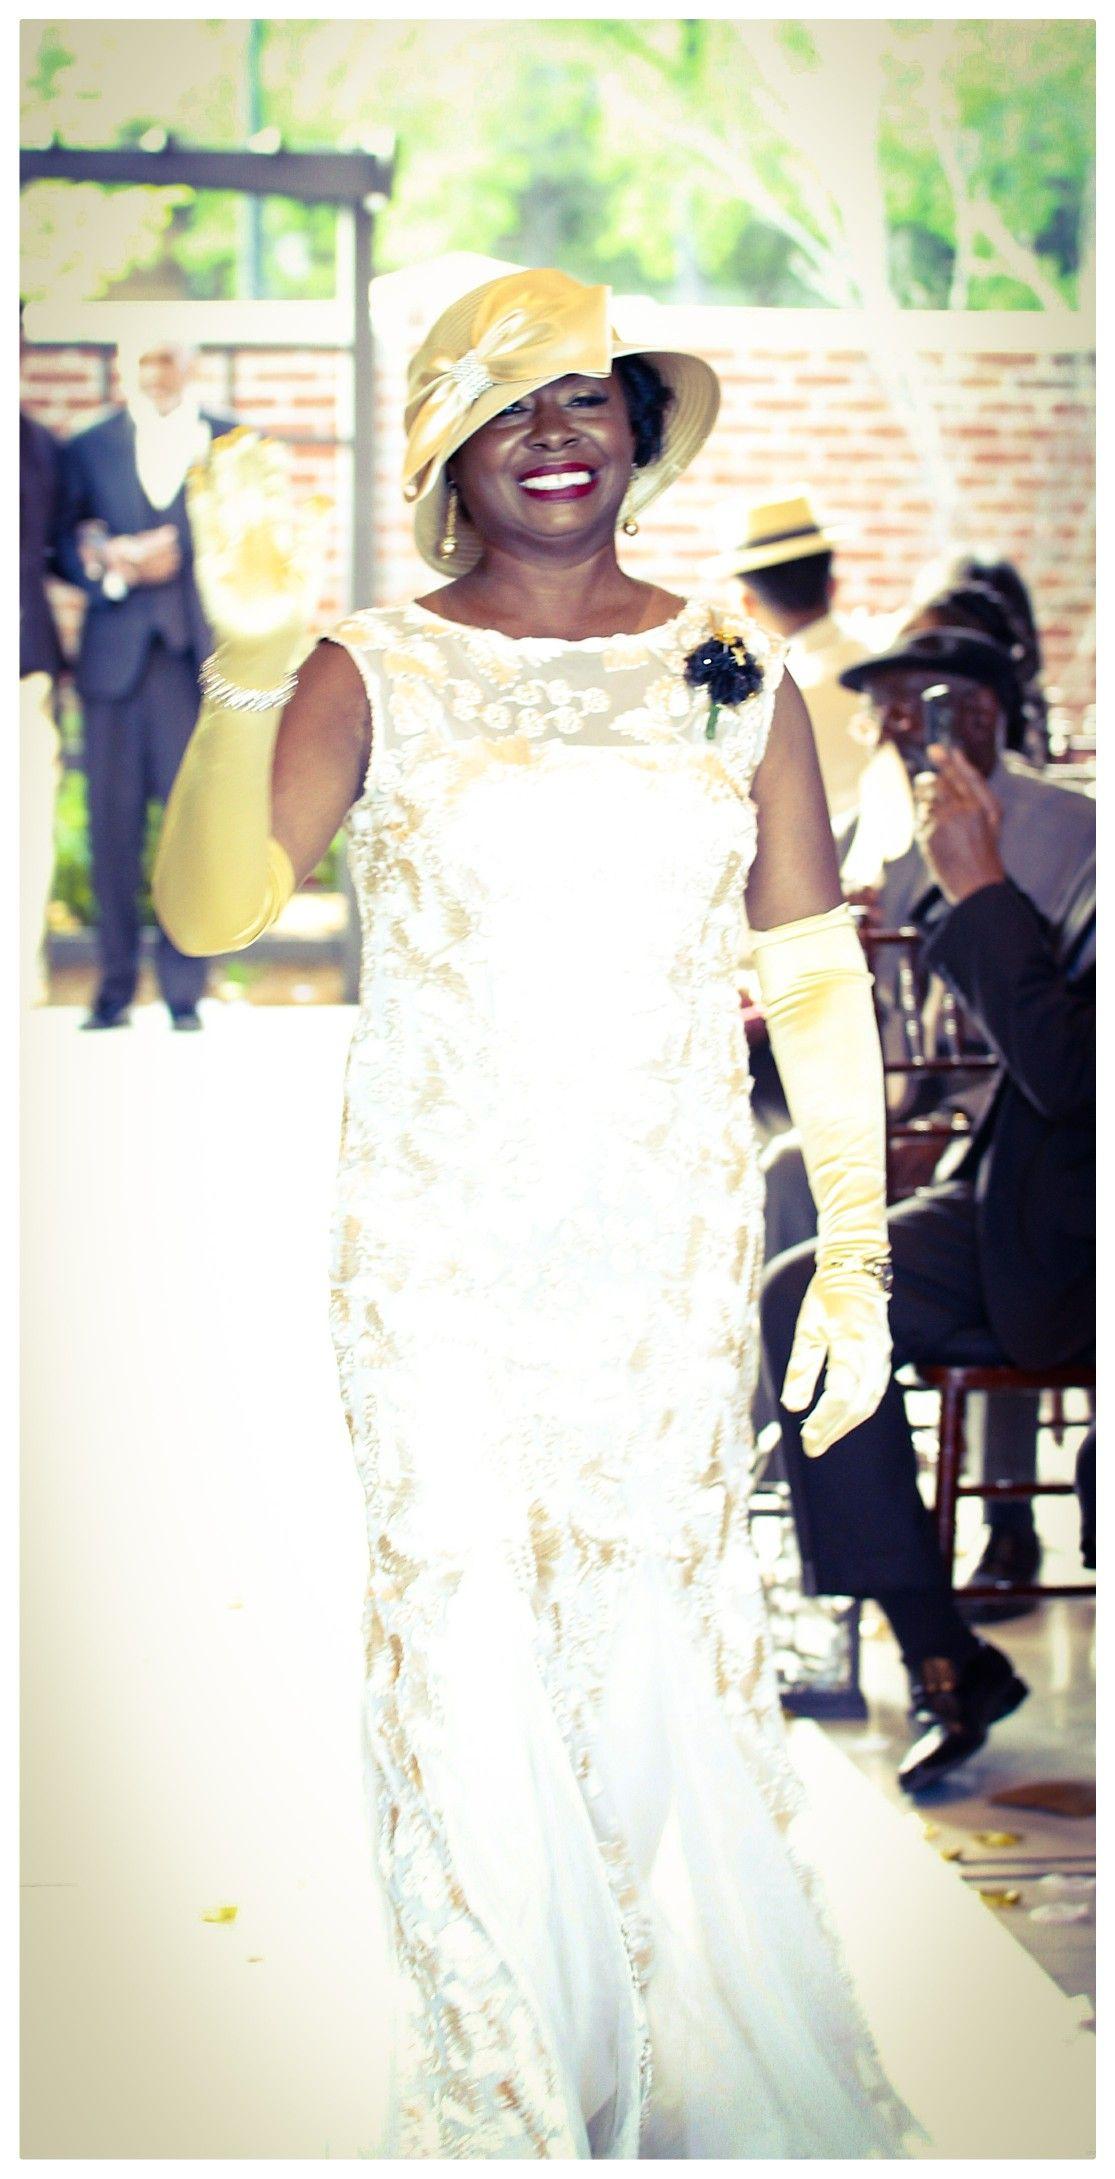 Pin by Cherise\' Tidwell on Harlem Nights theme wedding | Pinterest ...